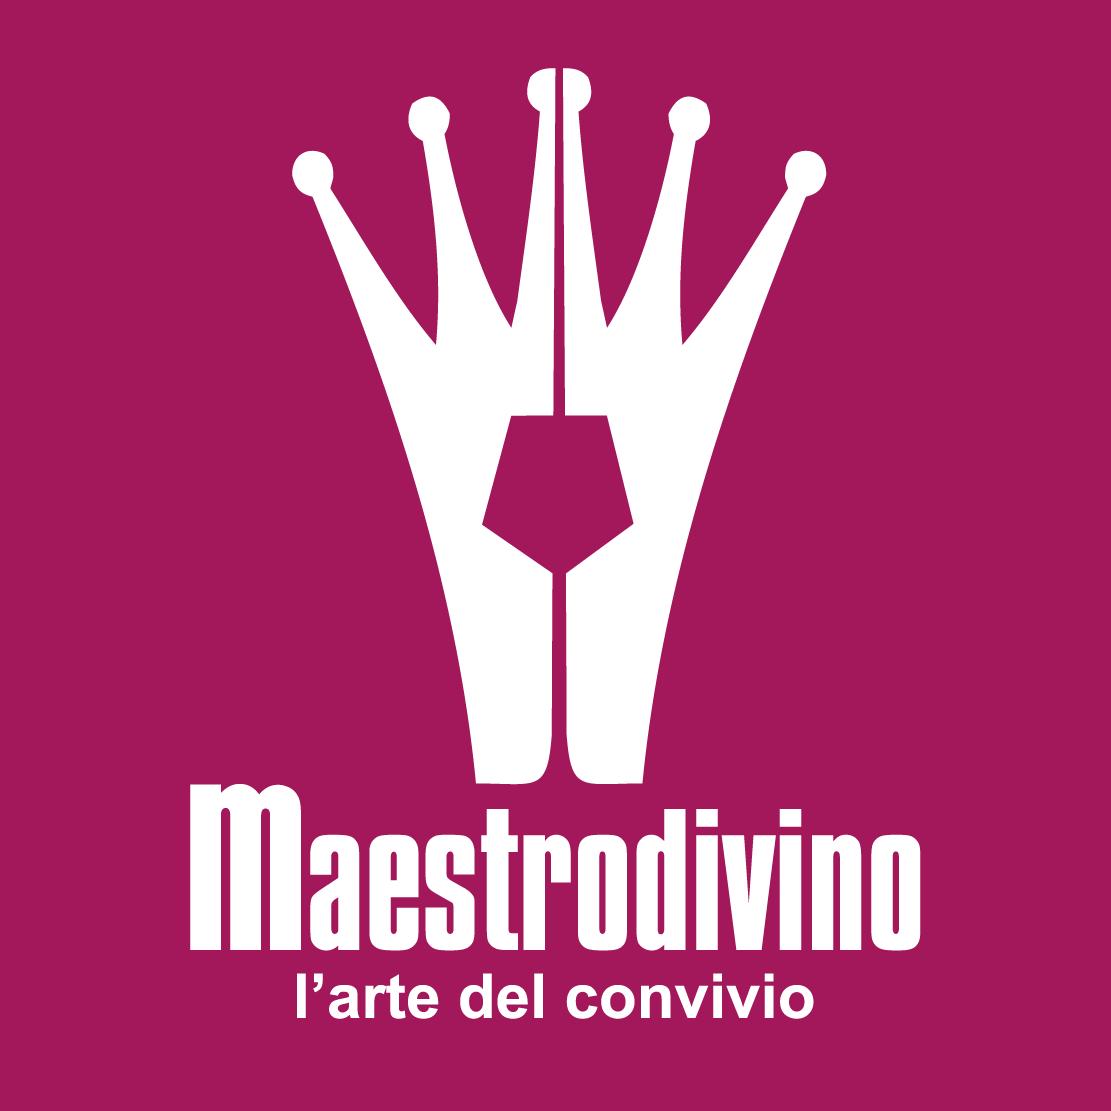 Maestrodivino